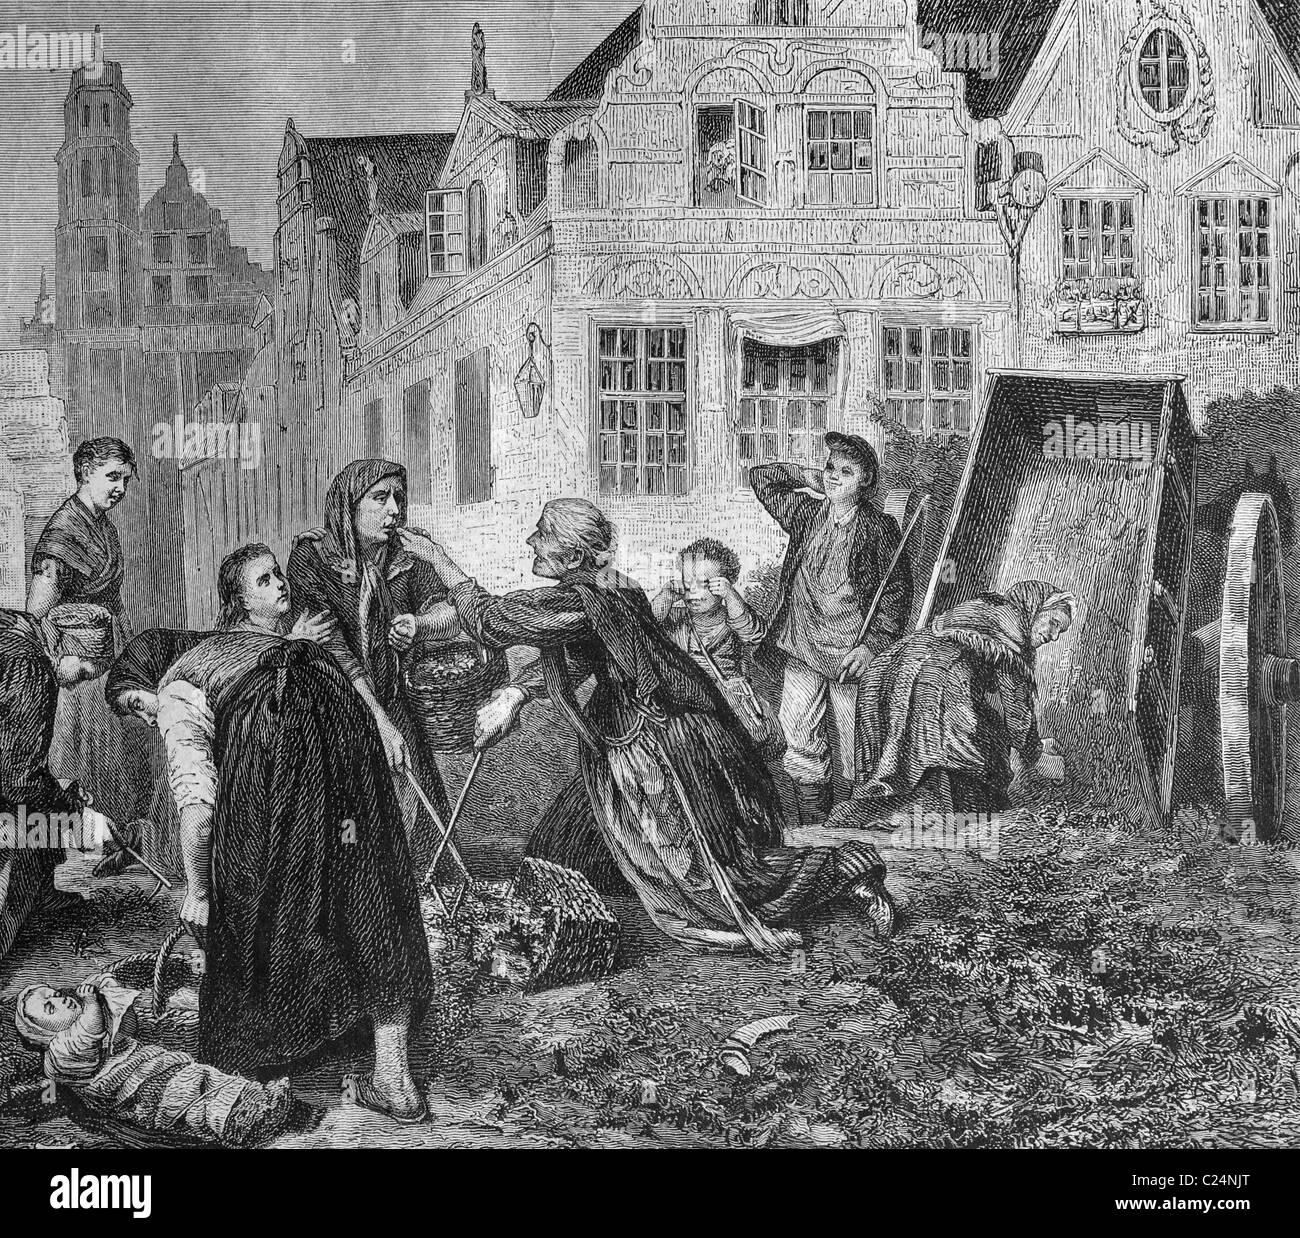 Rag gatherers, Danziger, Poland, historical illustration, 1877 - Stock Image